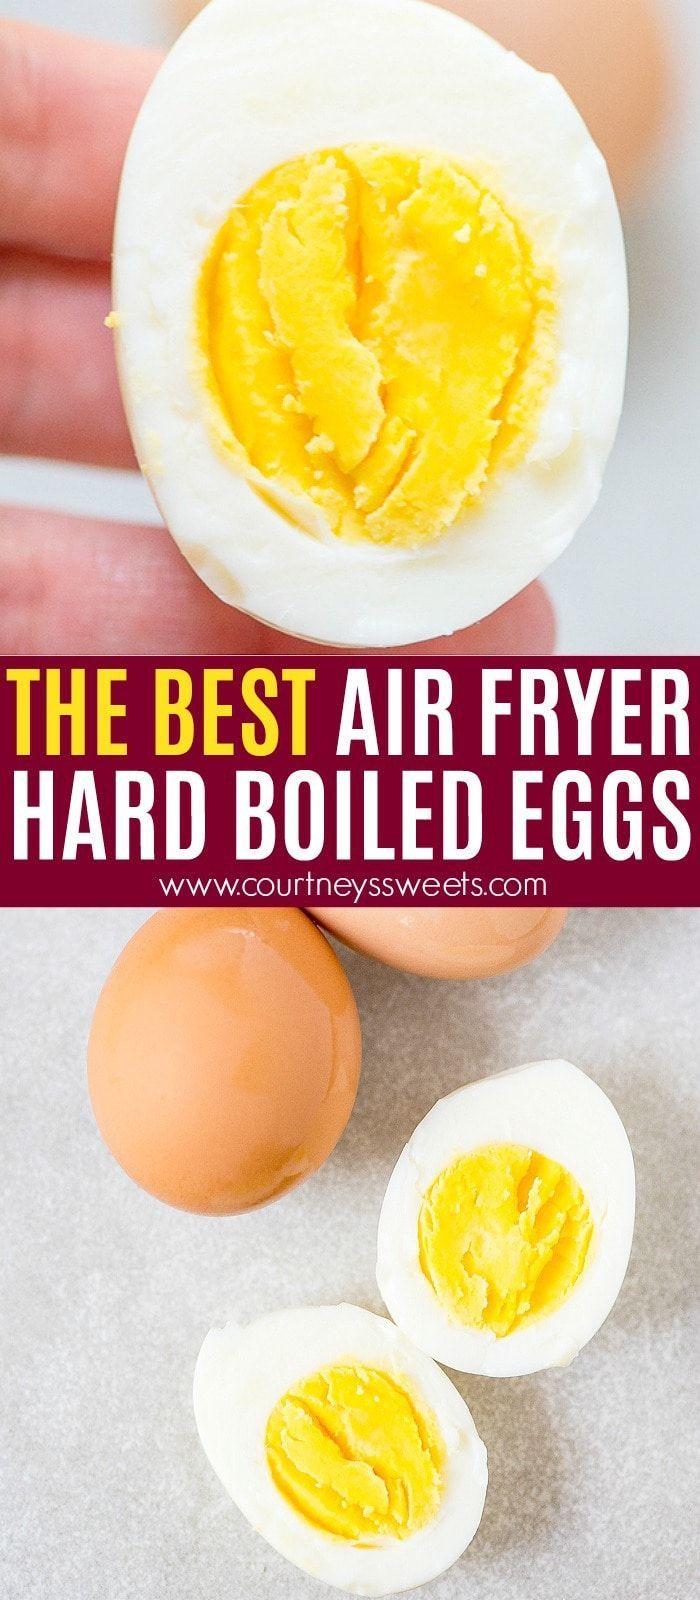 Air Fryer Hard Boiled Eggs - air fryer recipes #loseweight #weightlosstransformation #weightloss #diet #dietplan #ketorecipes #ketodiet #hardboiledeggs